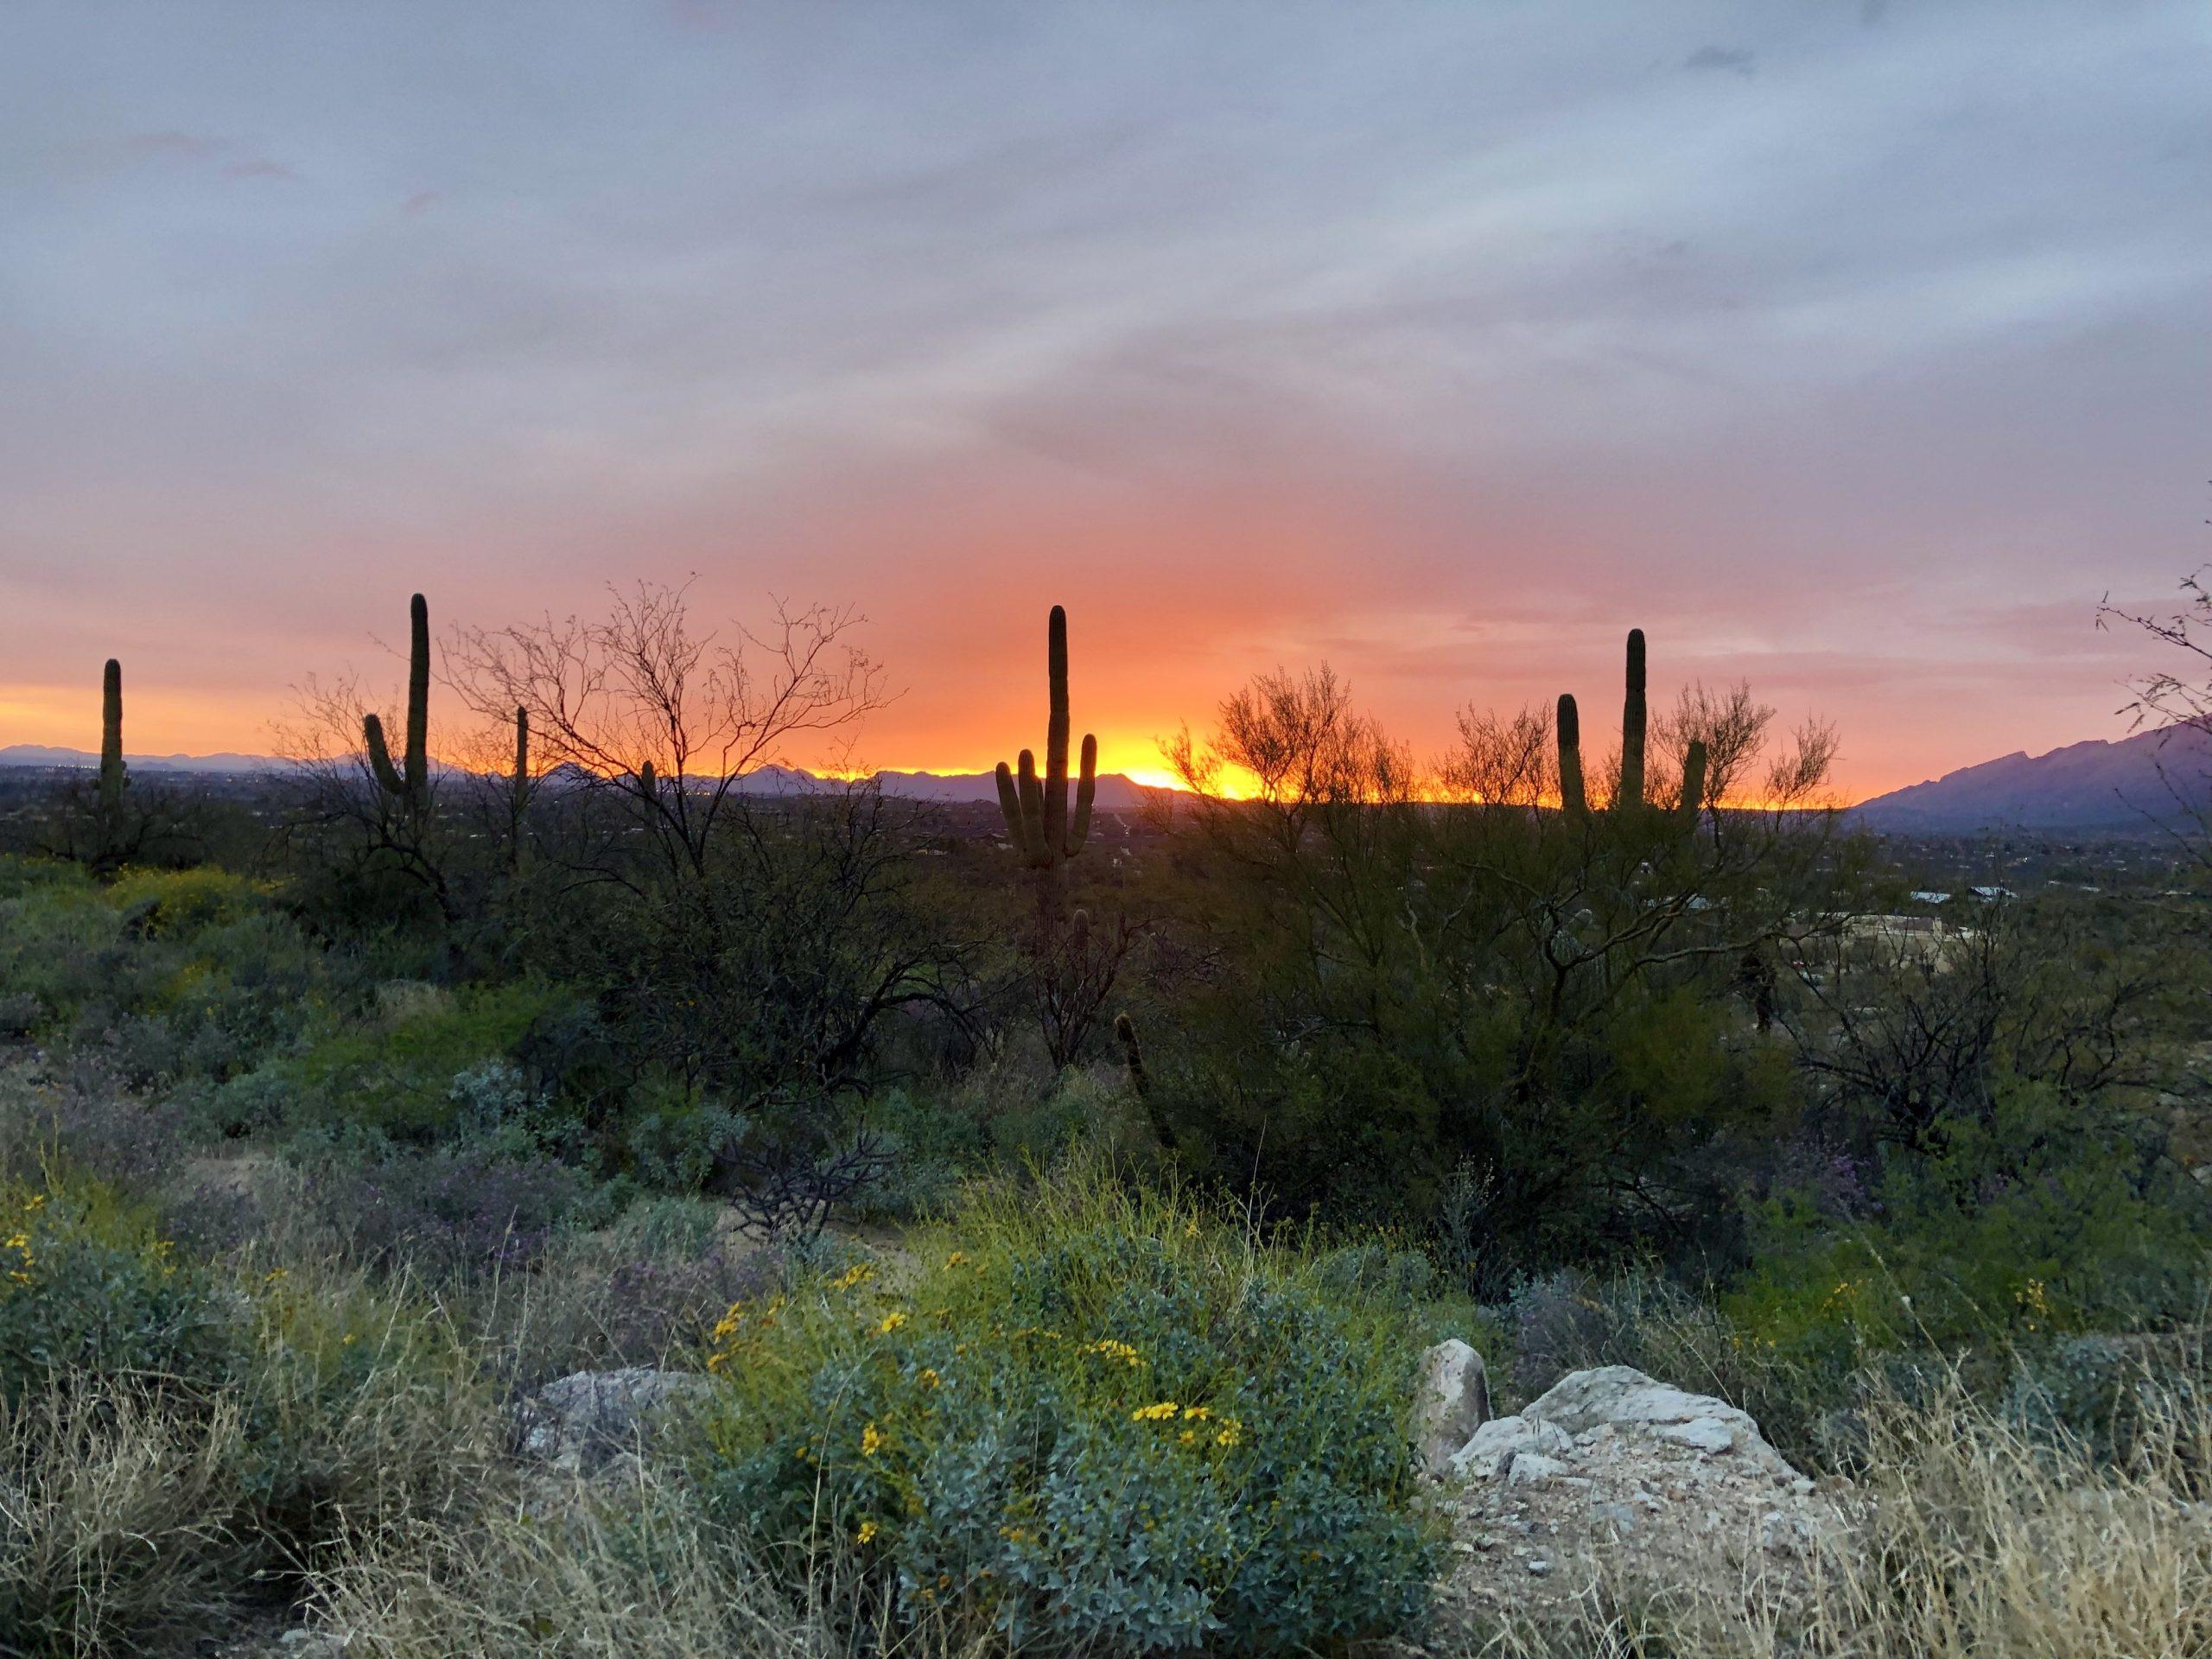 Palo Verde Ranch Lot 6.3 ac – $350,000